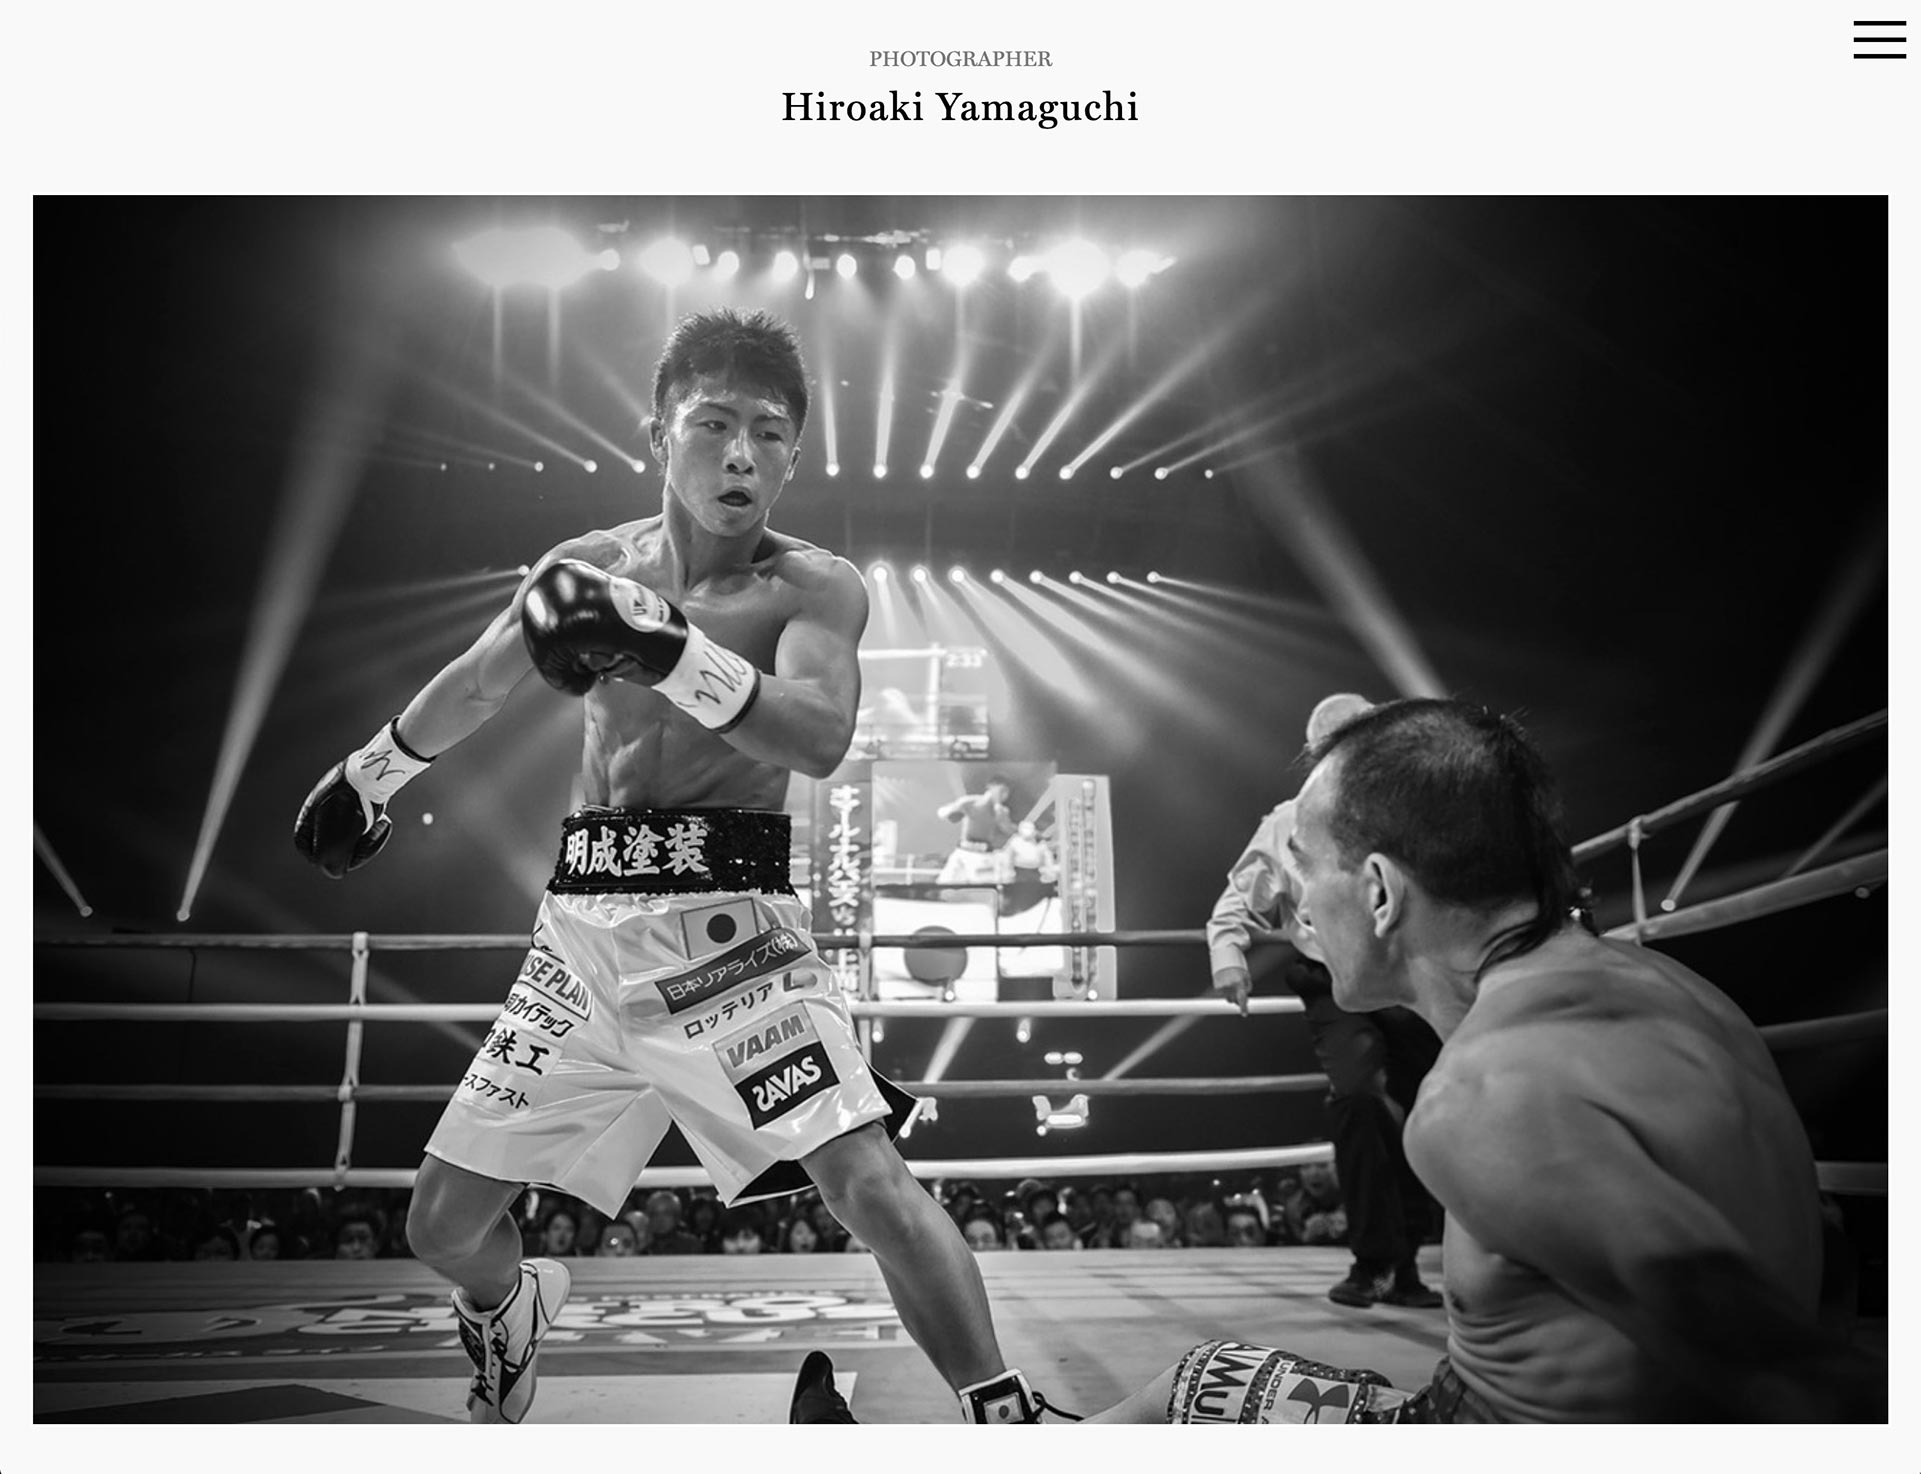 Hiroaki Yamaguchi - PHOTOGRAPHER